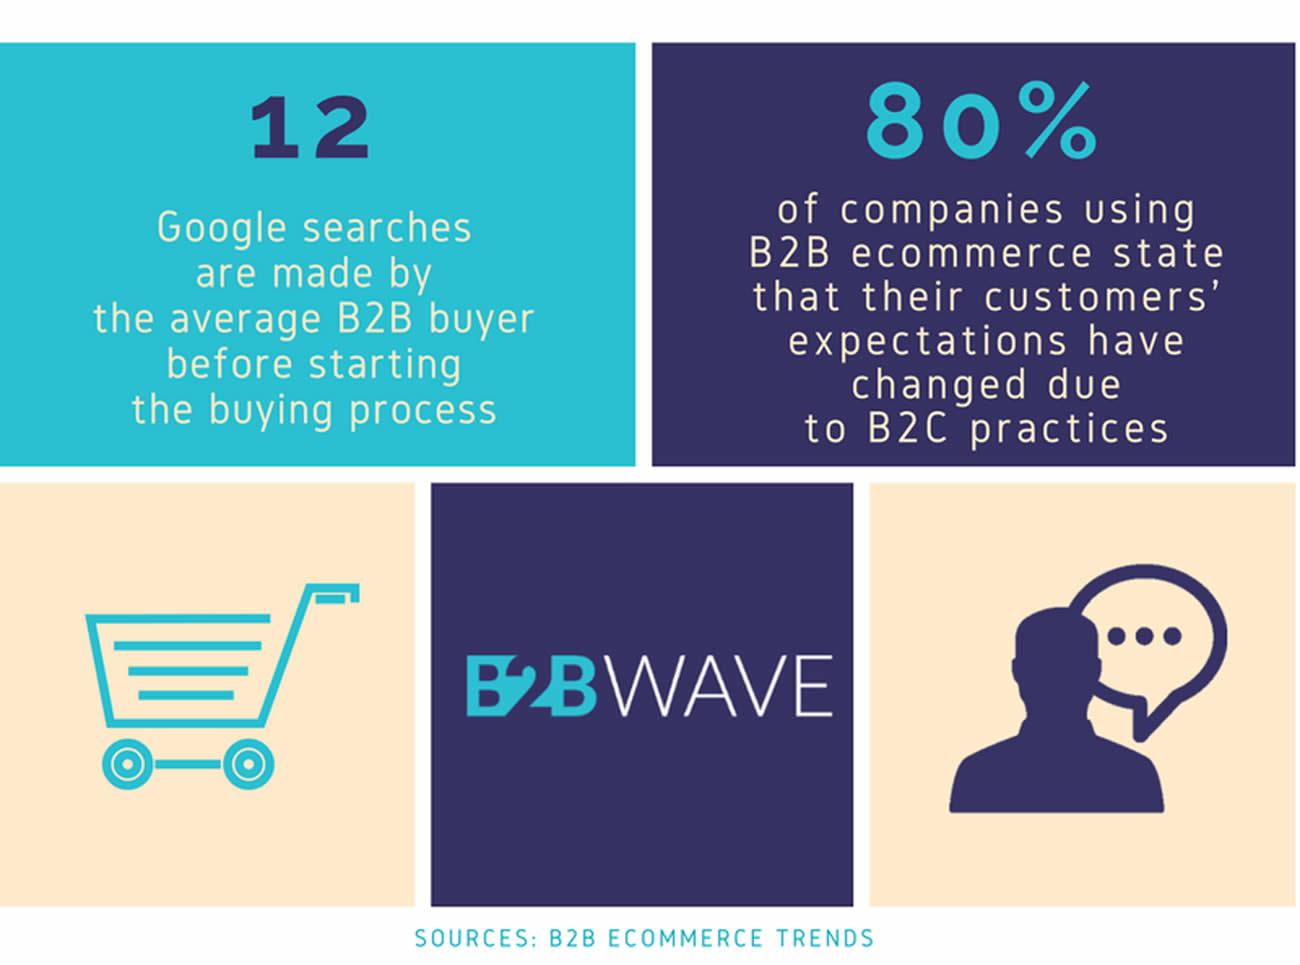 Stats about B2B wholesale ecommerce